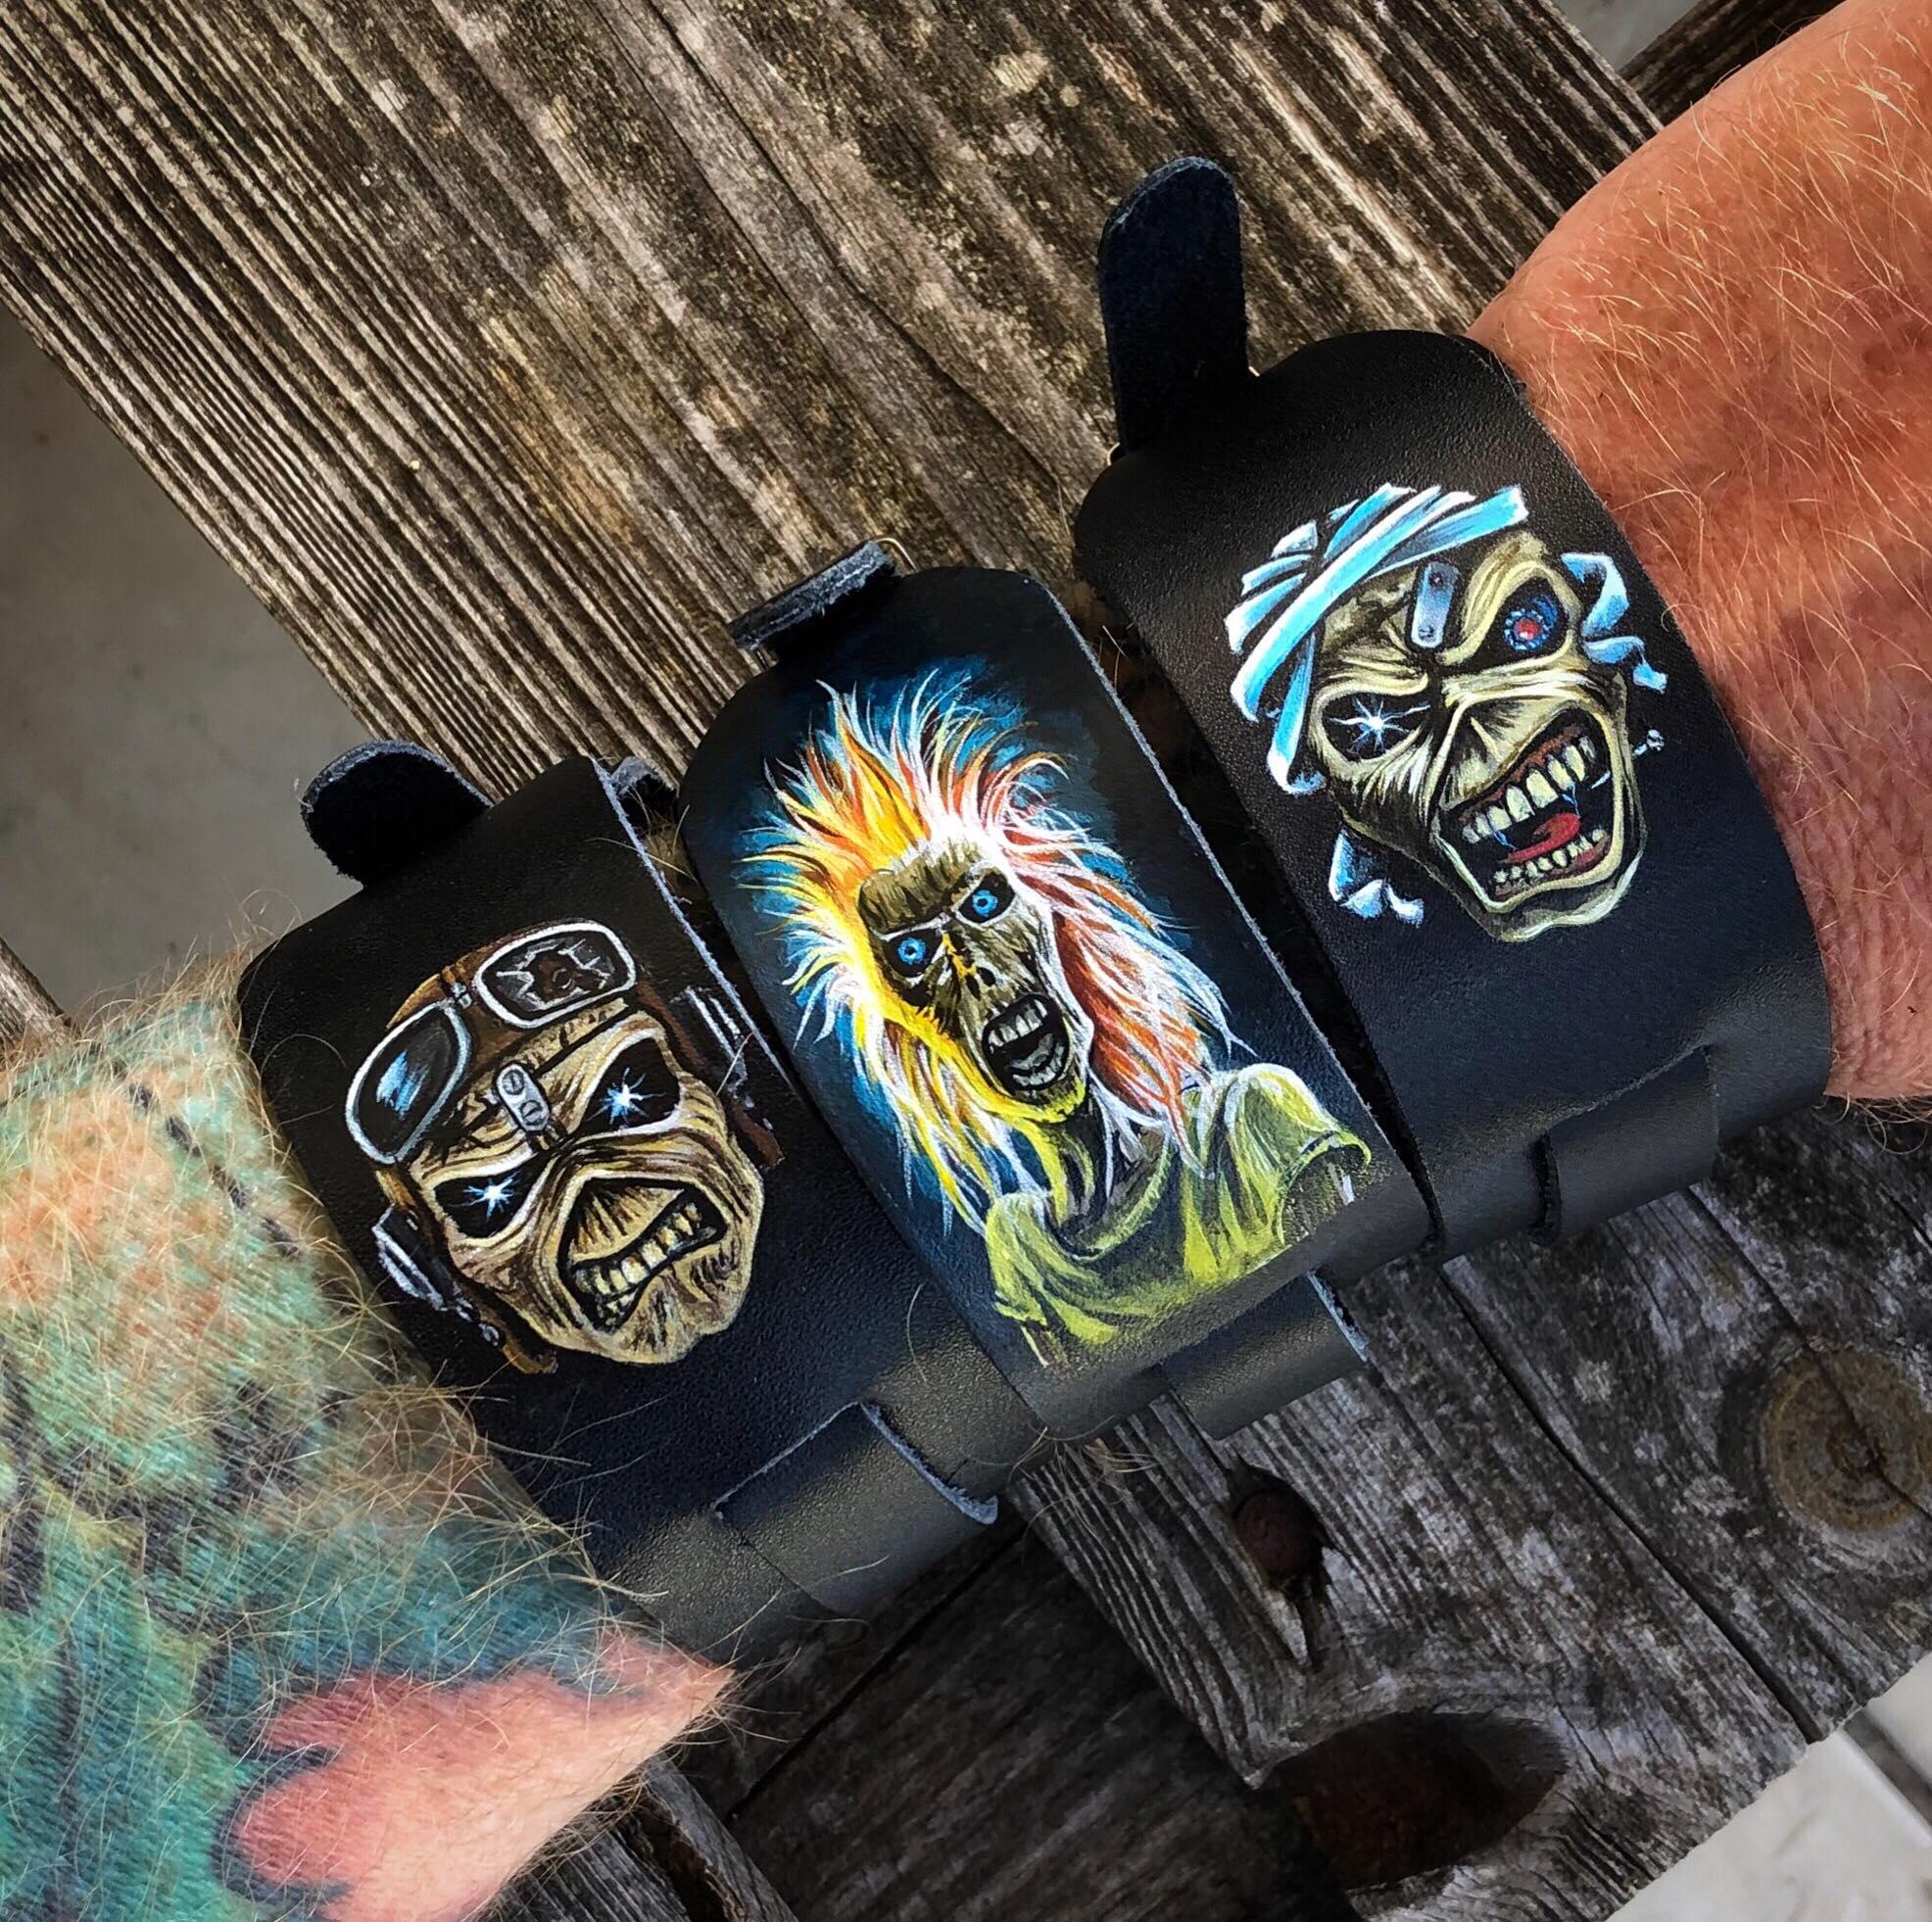 Iron Maiden Eddie wristband